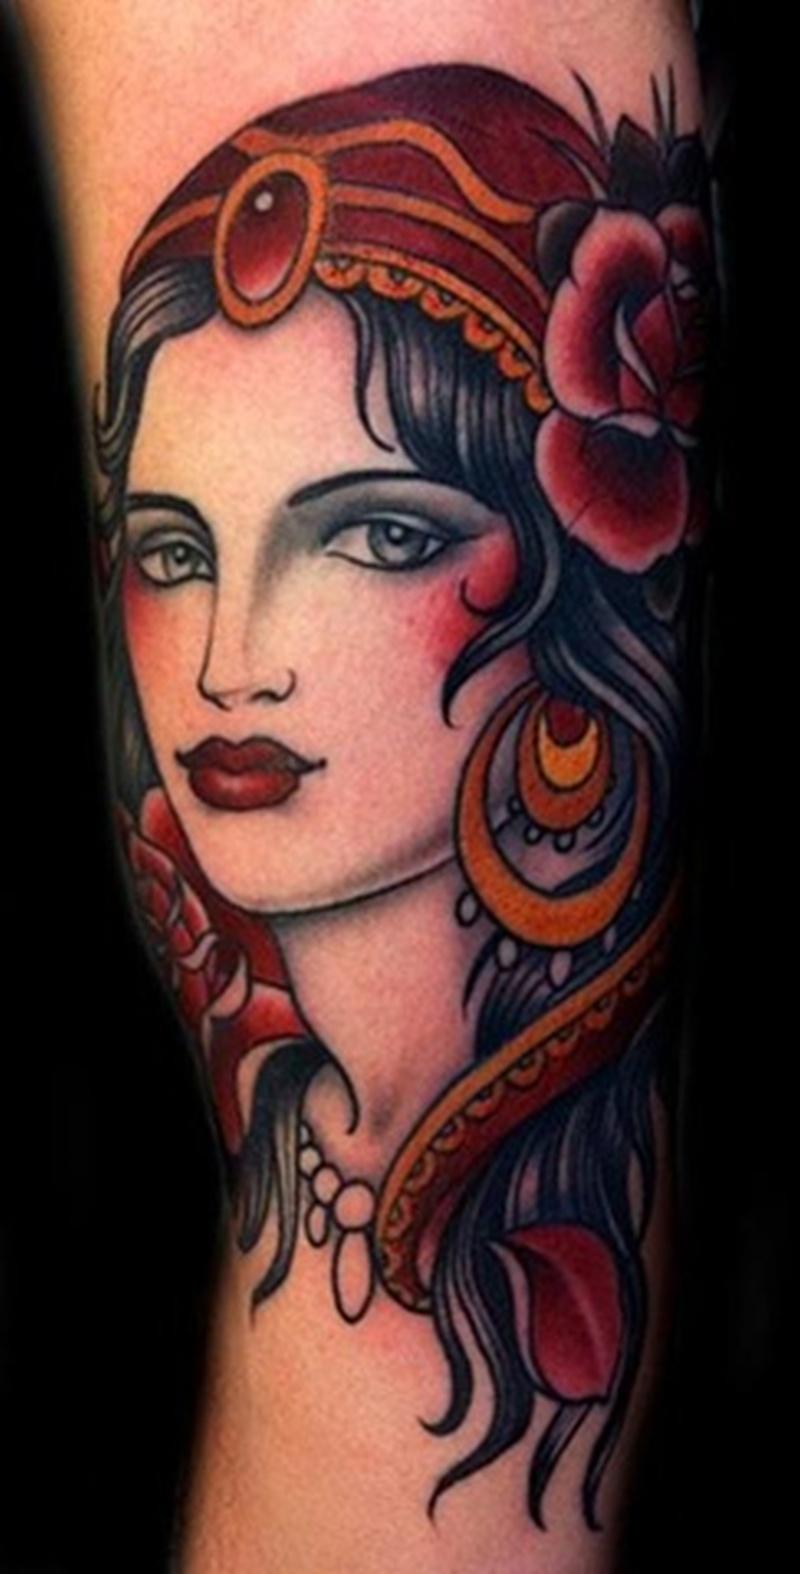 Beautiful girl head tattoo design tattoos book for Tattoo girl book